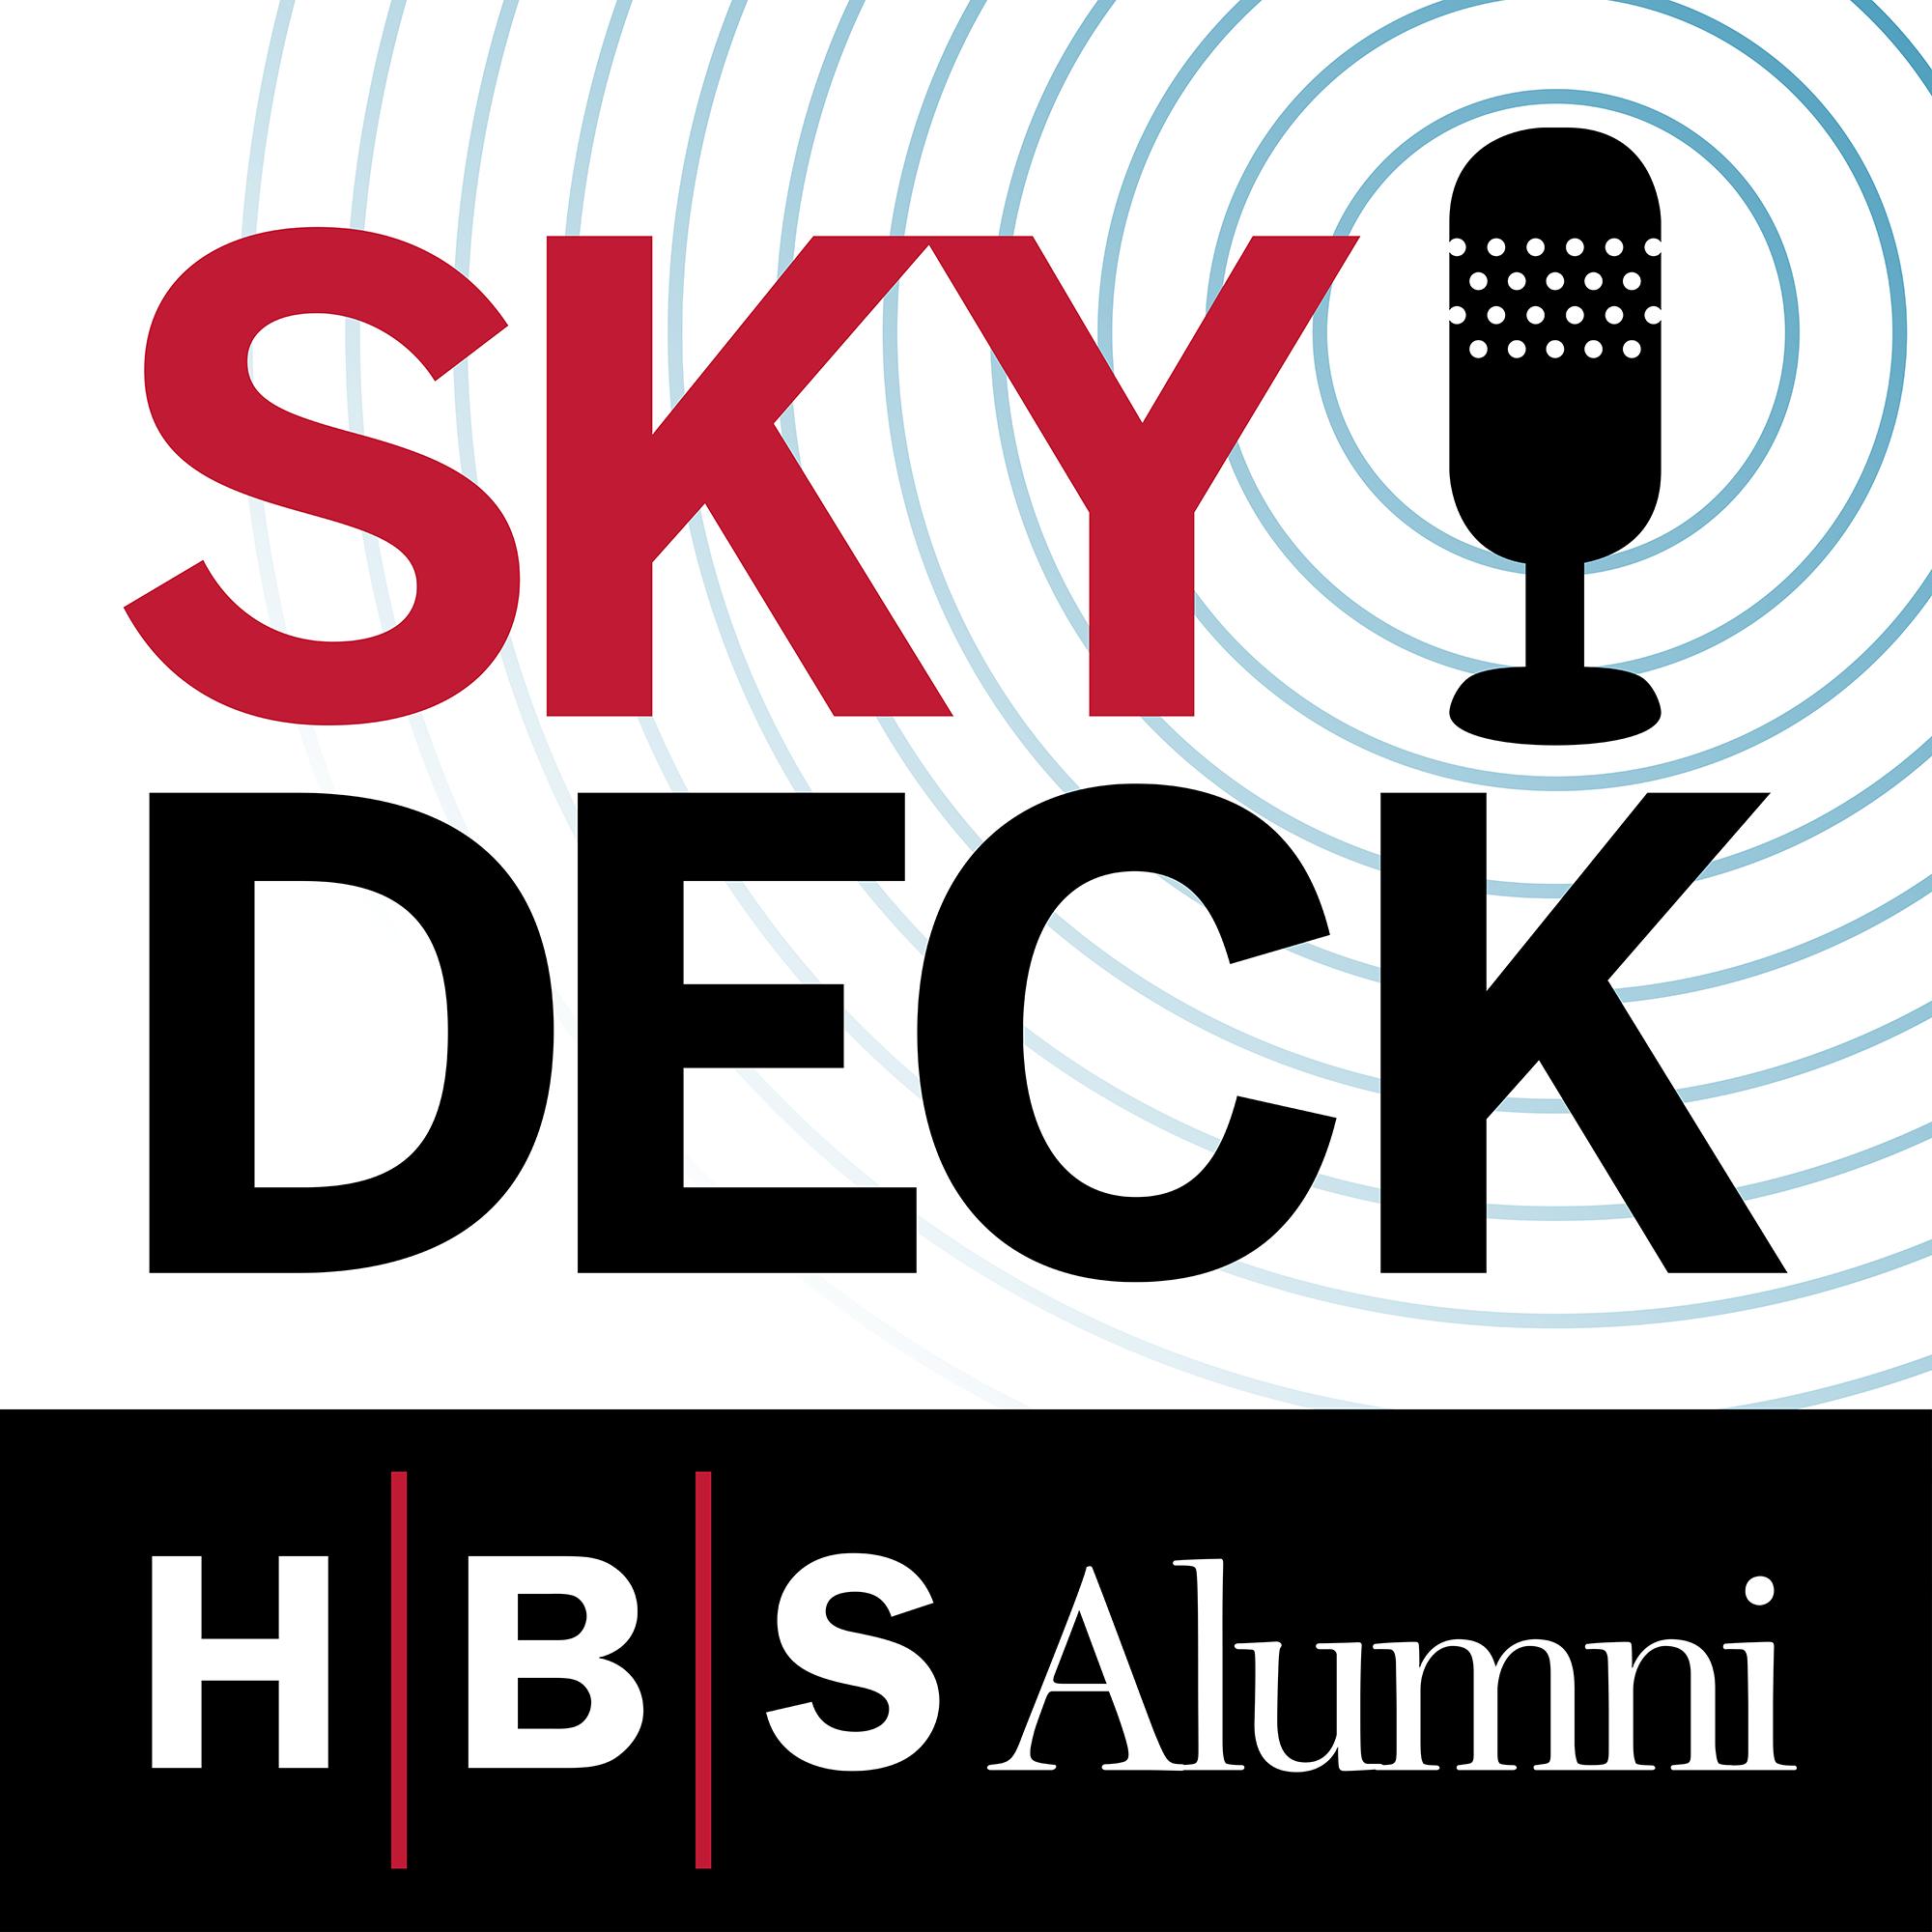 Skydeck logo 2000x20002 copy